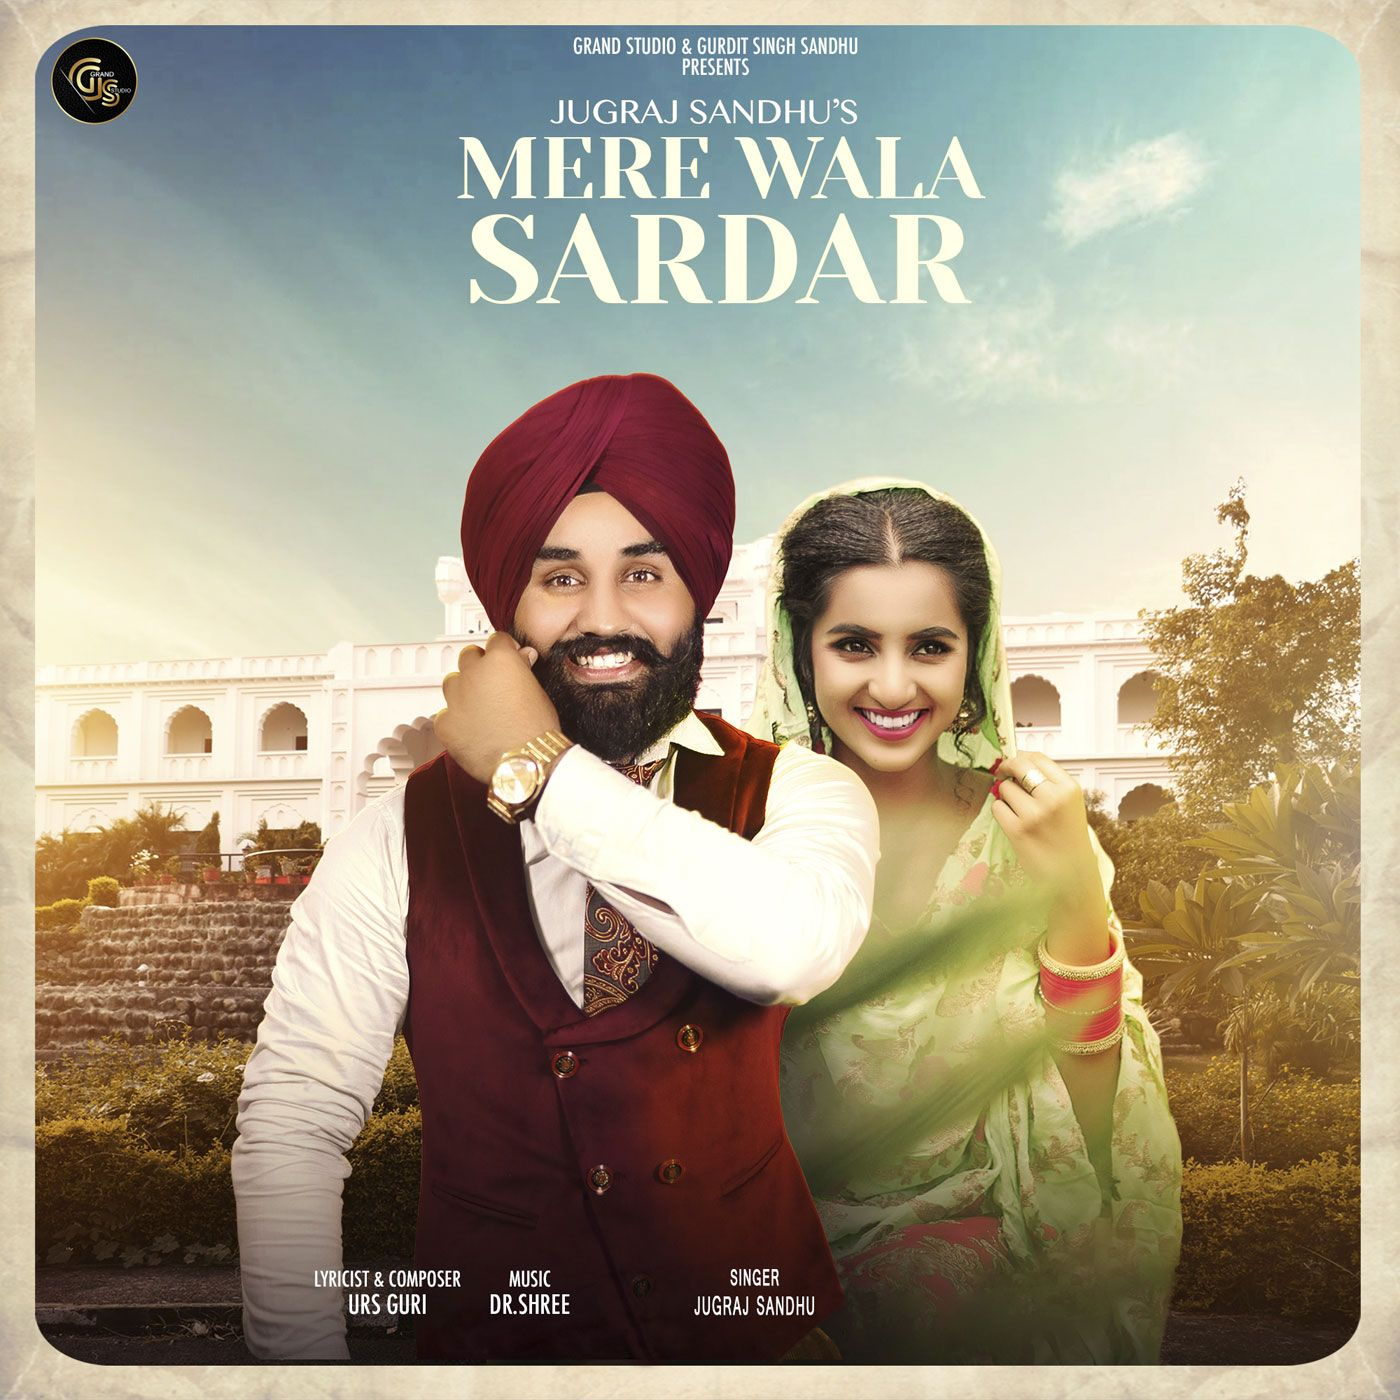 Mere Wala Sardar By Jugraj Sandhu Mp3 Song Download Mp3 Song Songs